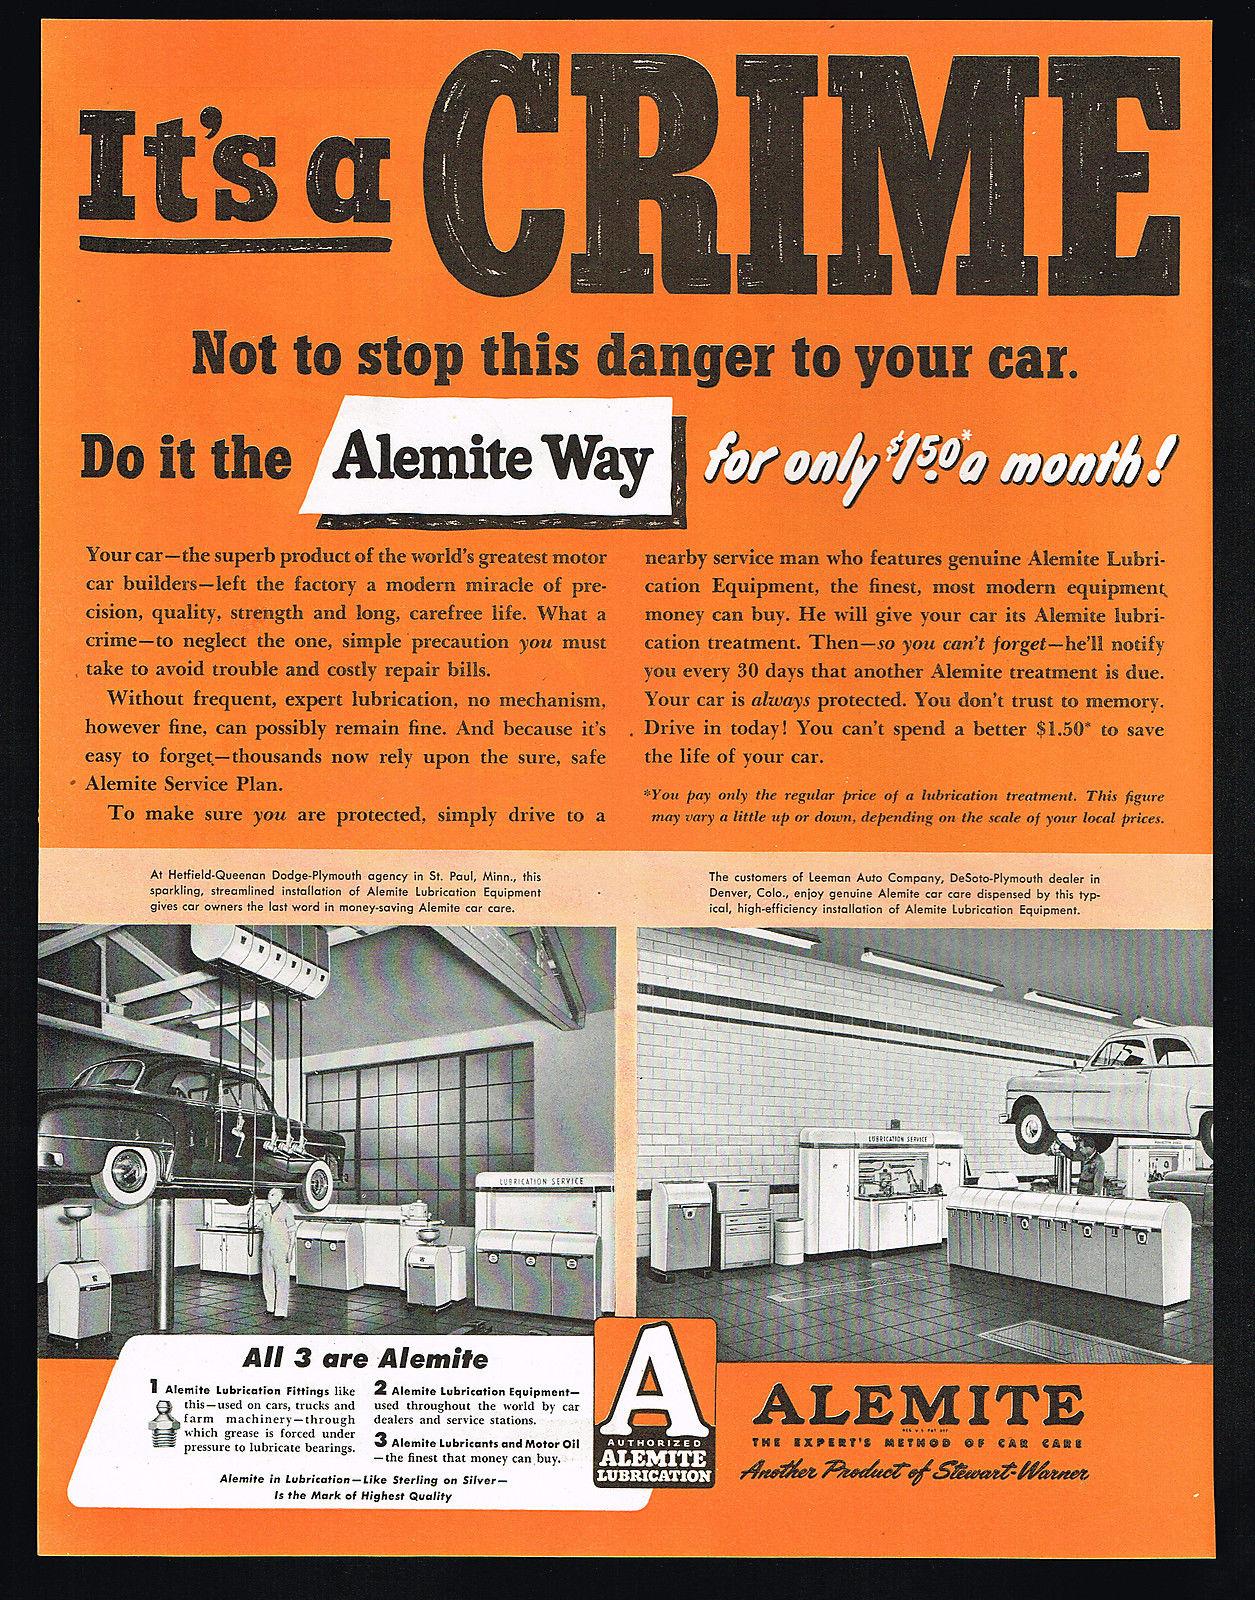 Alemite_Ad_1951_benches.jpg